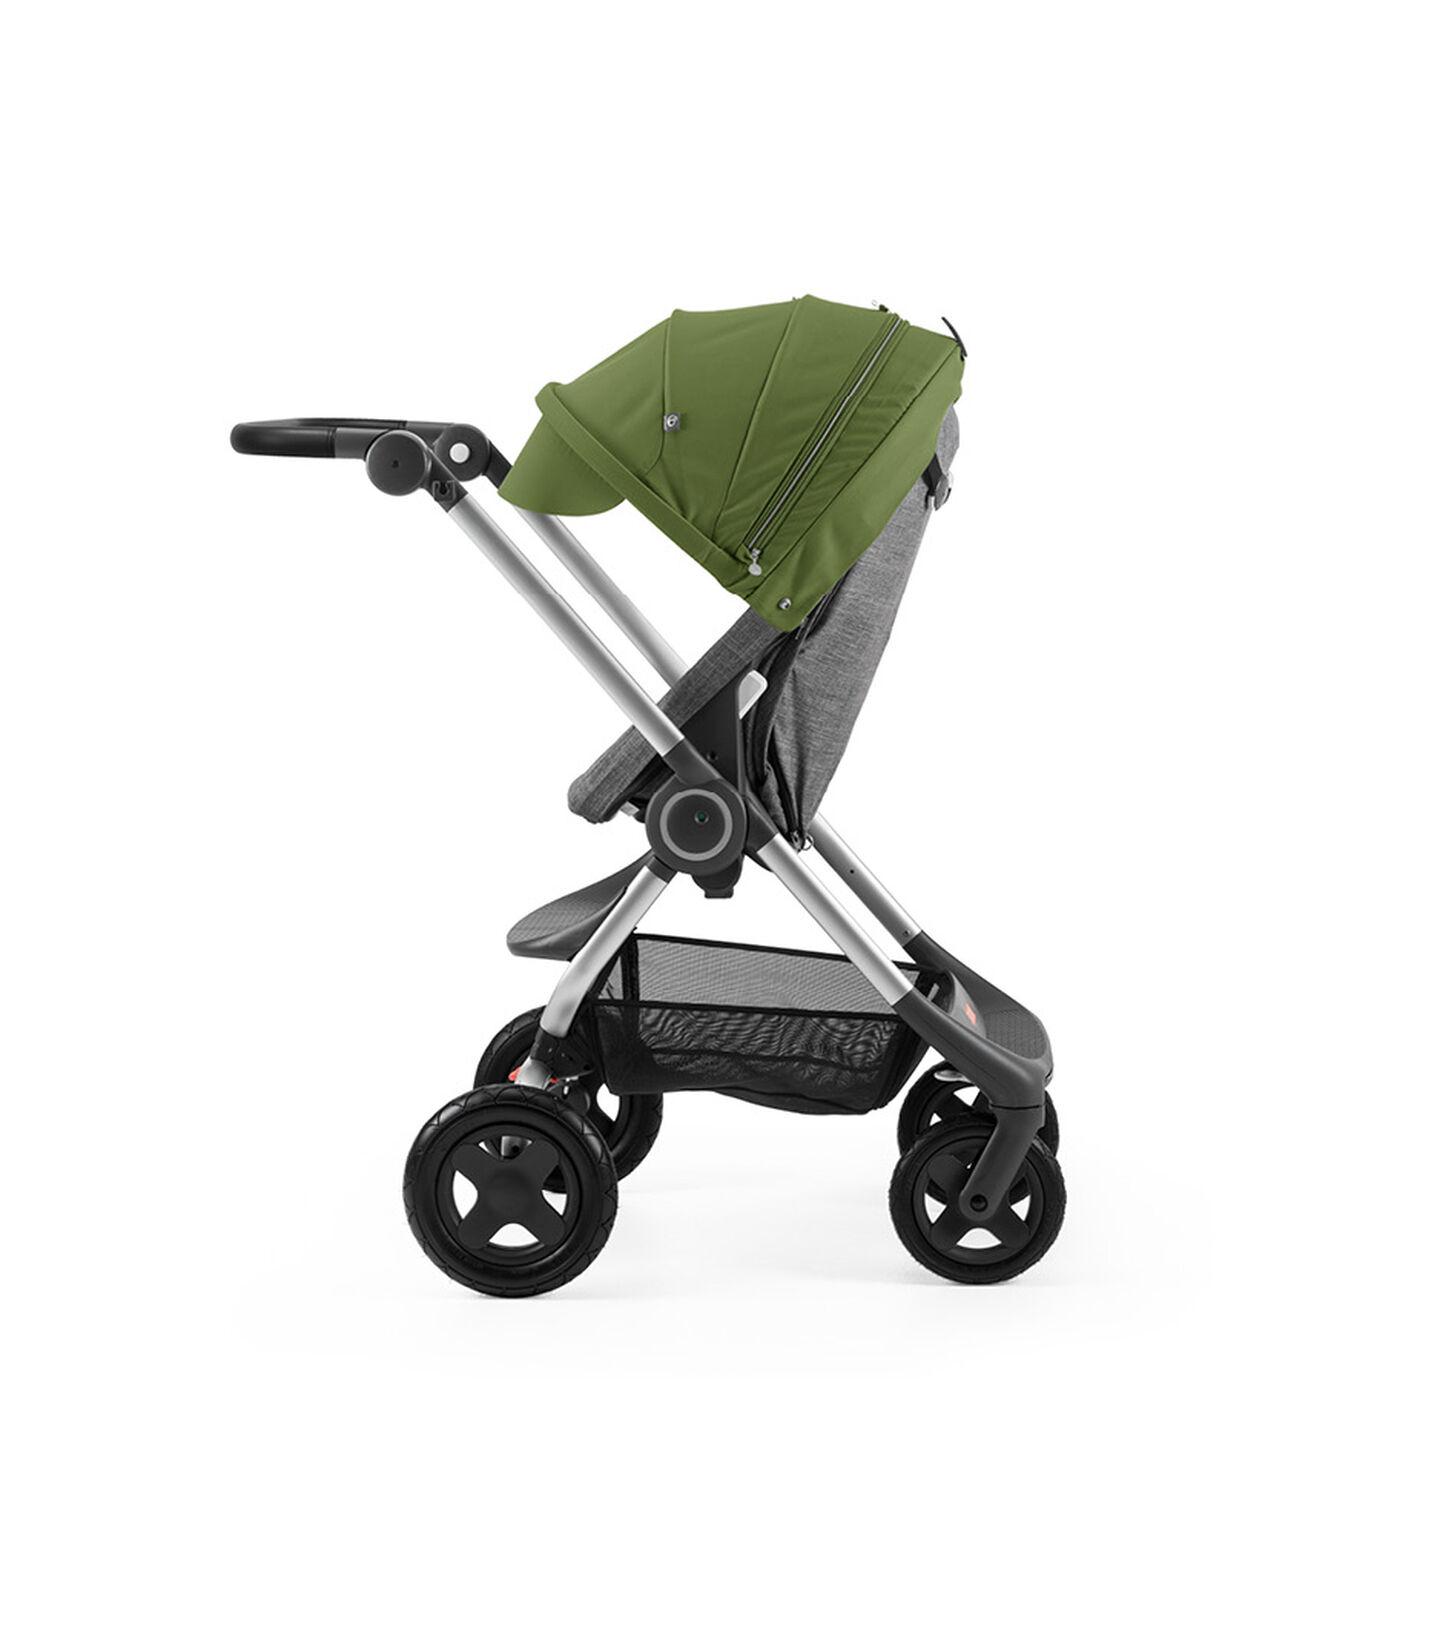 Stokke® Scoot™ Kap in kleur Green, Green, mainview view 1